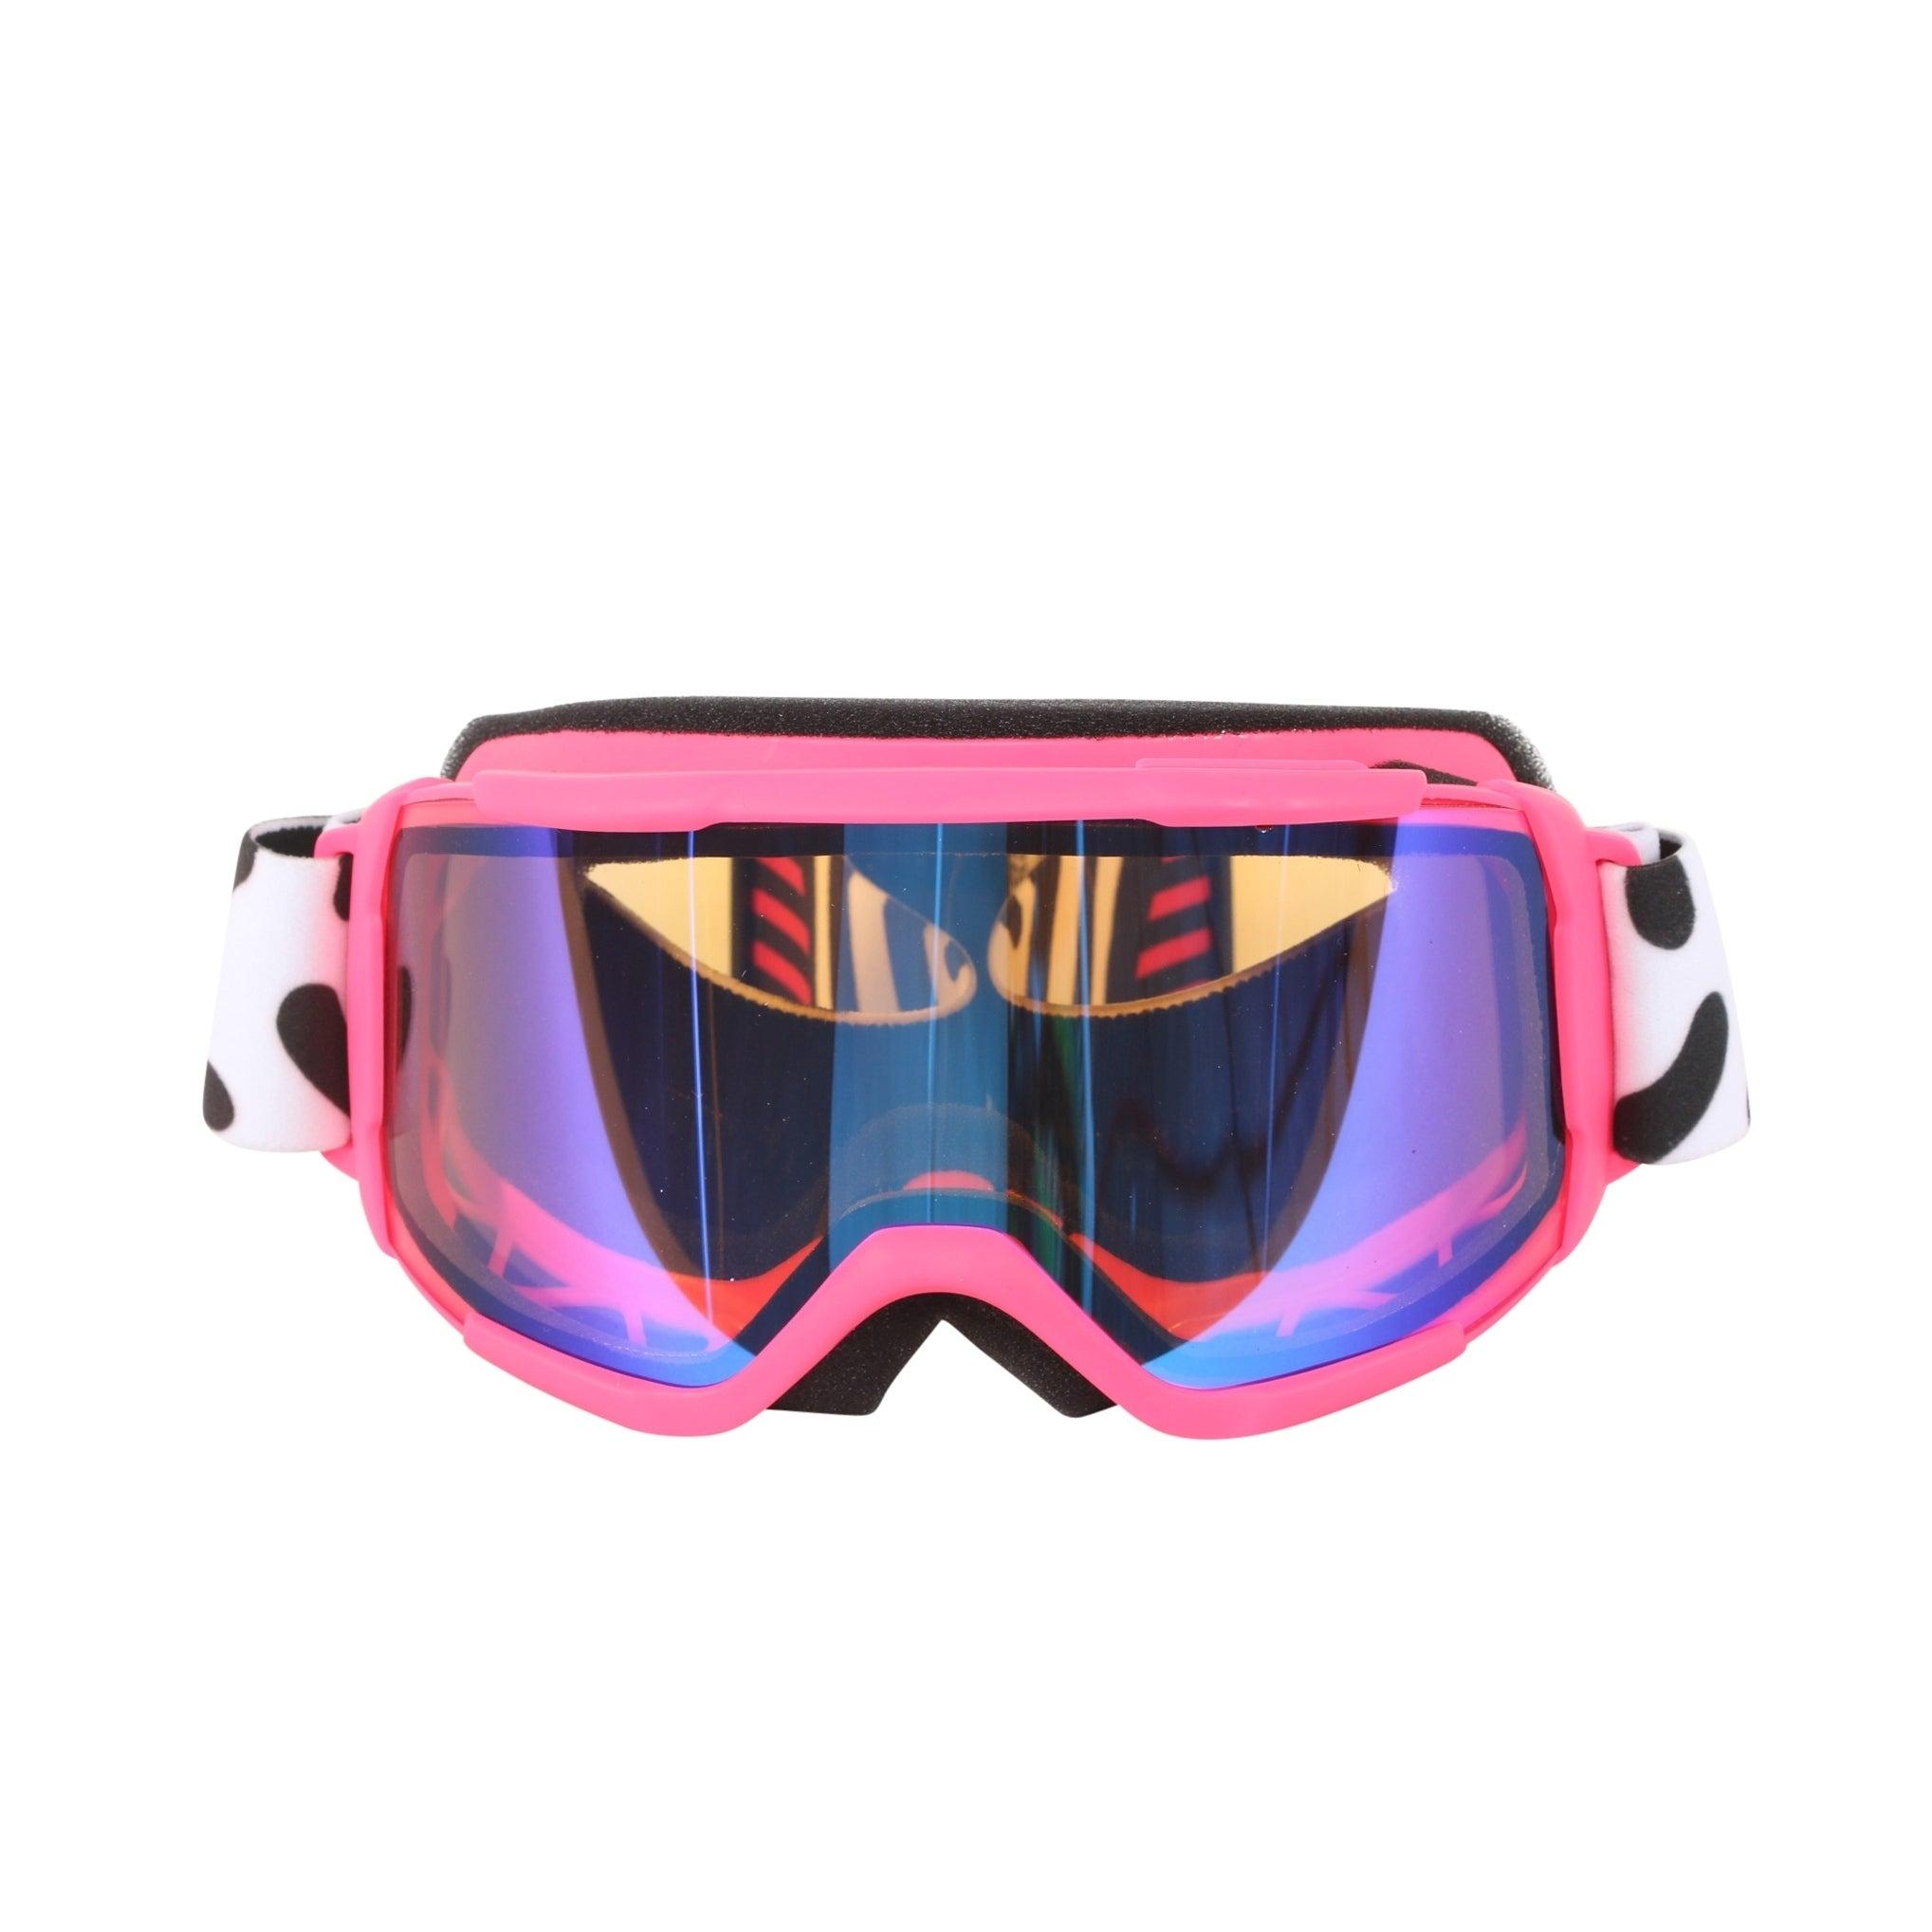 Smith Optics Pink Jam Daredevil Youth Medium Fit Goggles ...